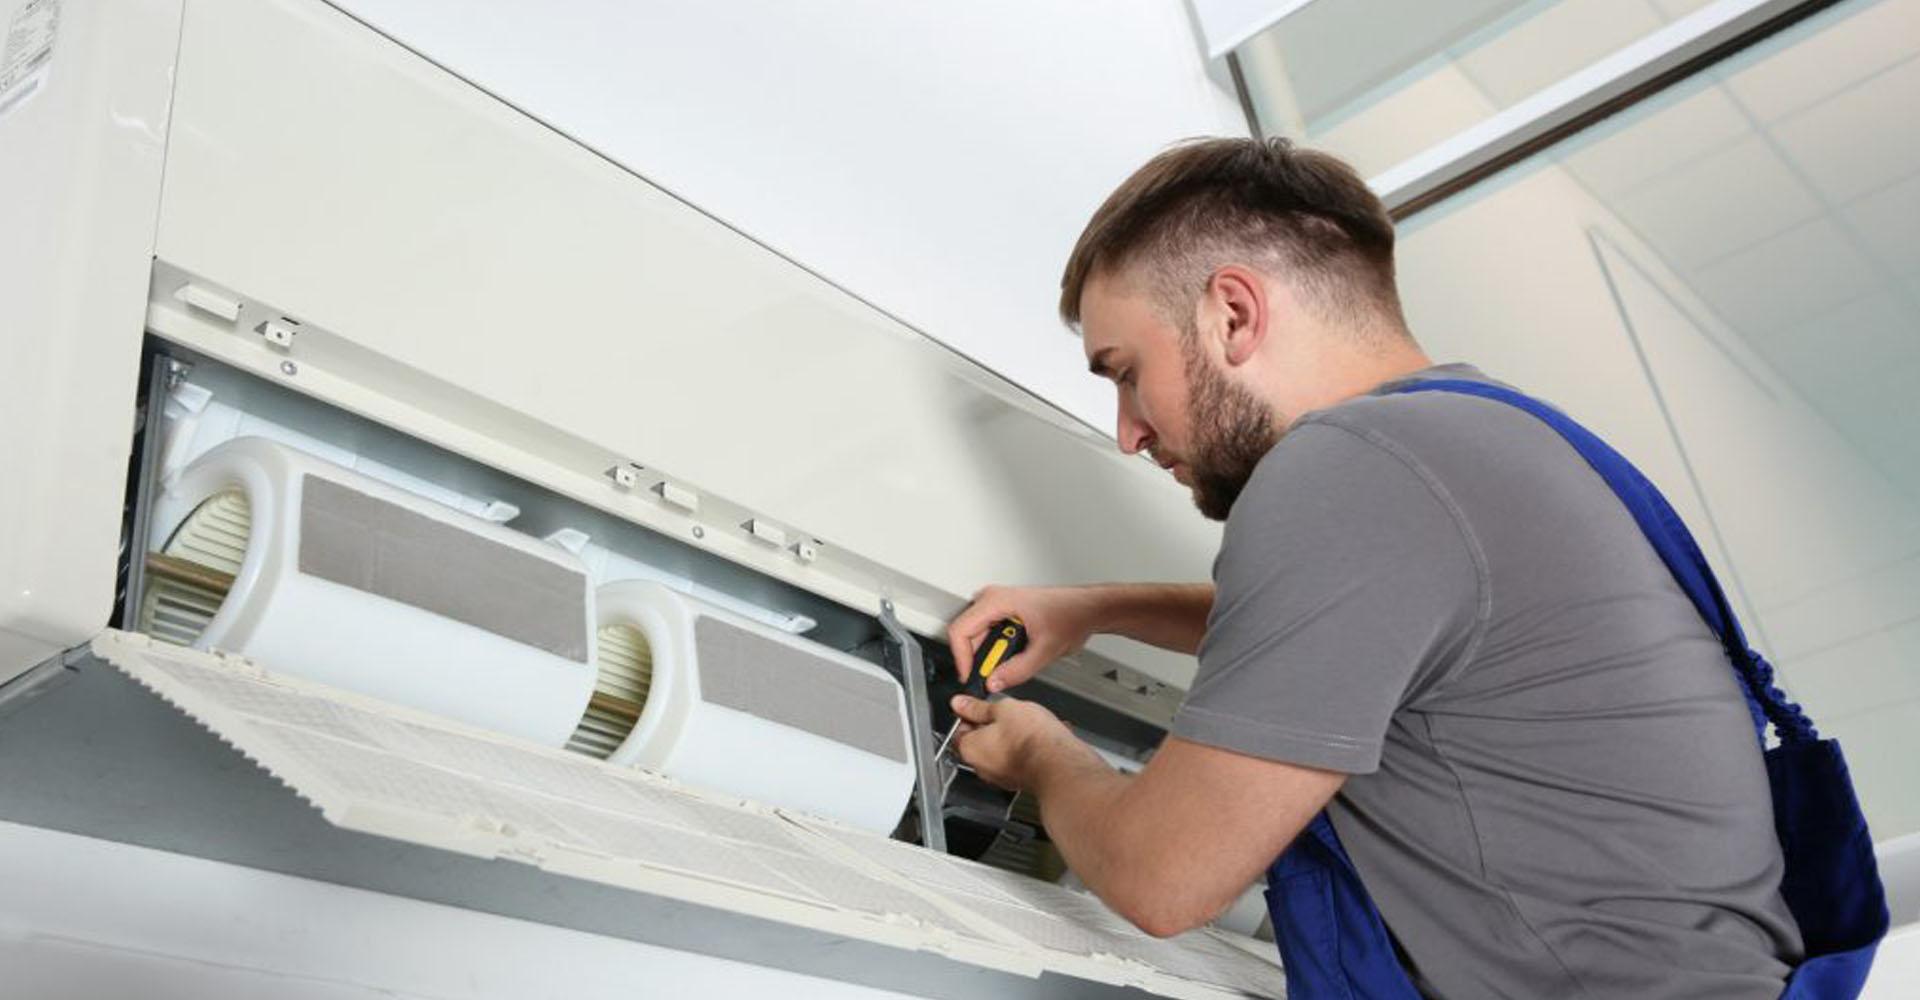 """HVAC contractor in Livermore, California Best HVAC contractor in Livermore, California Top HVAC contractor Air conditioning contractor Livermore Heating contractor Livermore Residential HVAC contractor Commercial HVAC contractor """